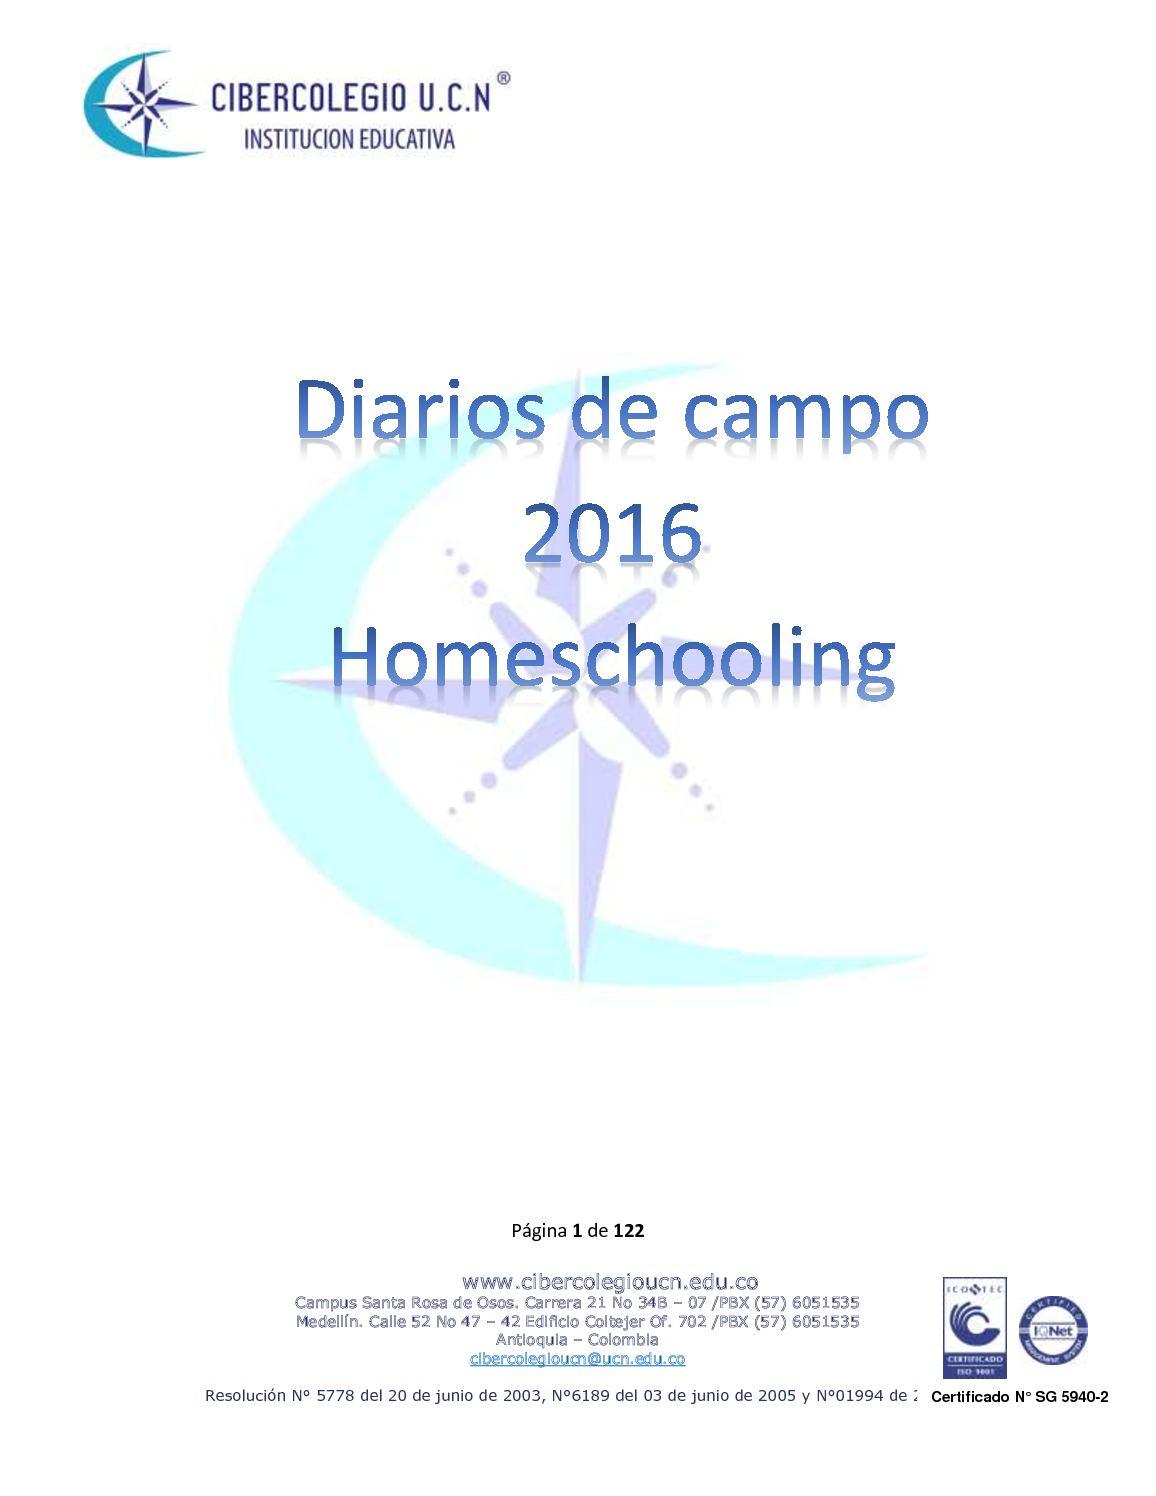 Diarios De Campo 2016 Homeschooling Pdf